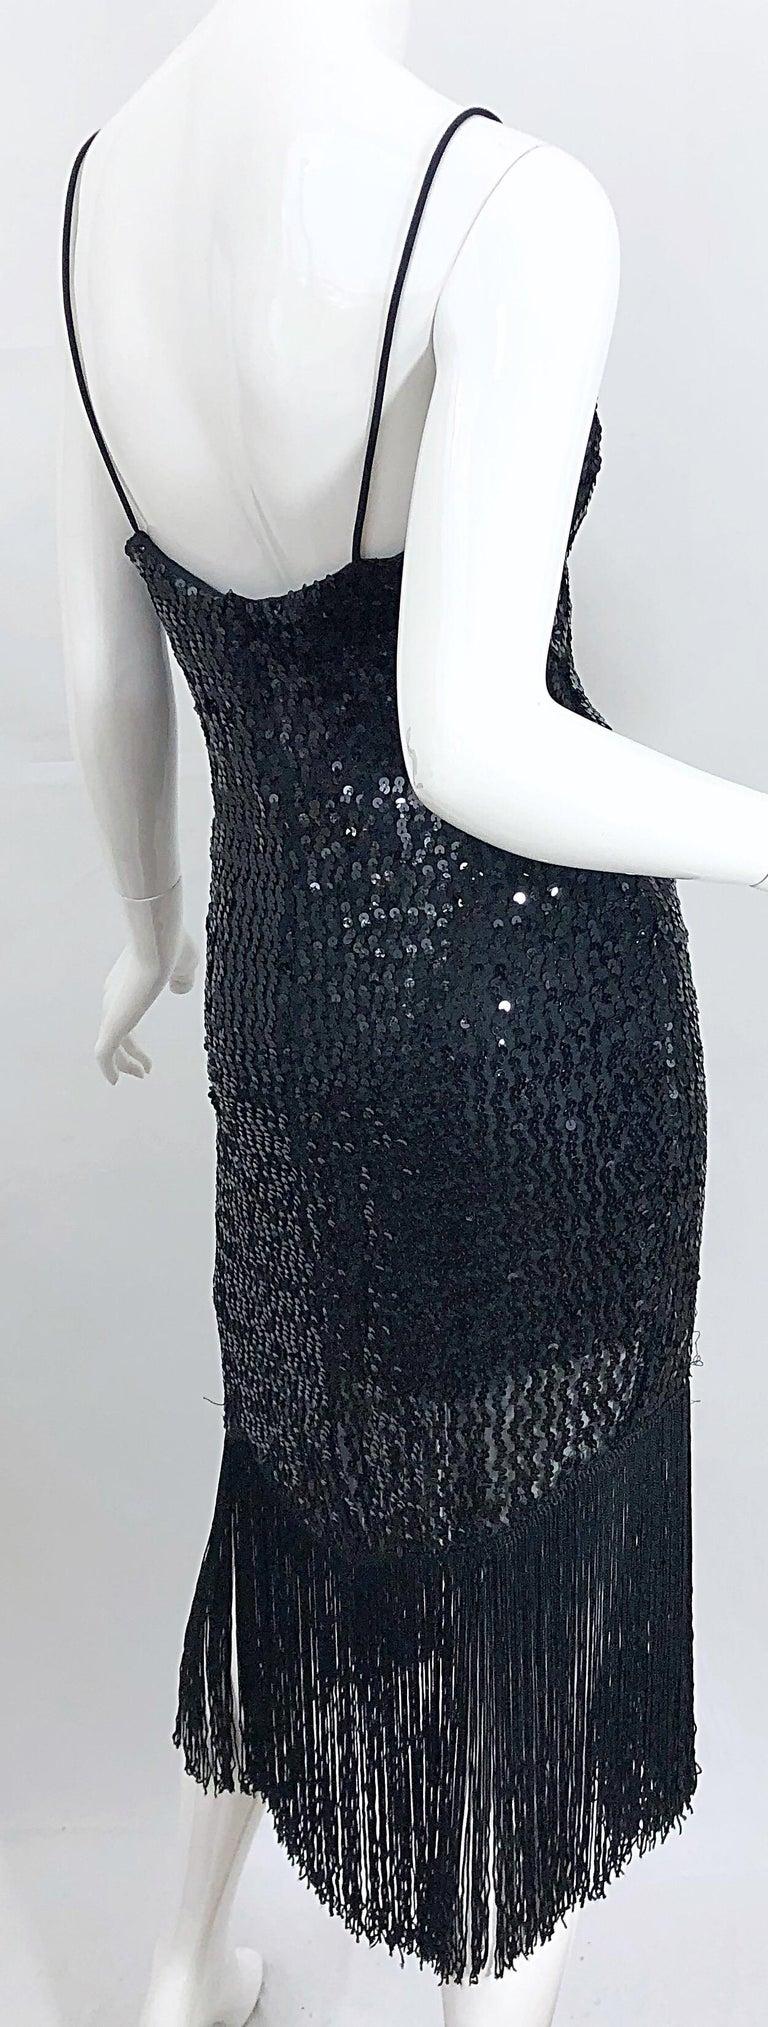 NWT 1970s Joy Stevens Size 10 / 12 Black Sequined Flapper Style Vintage Dress For Sale 3